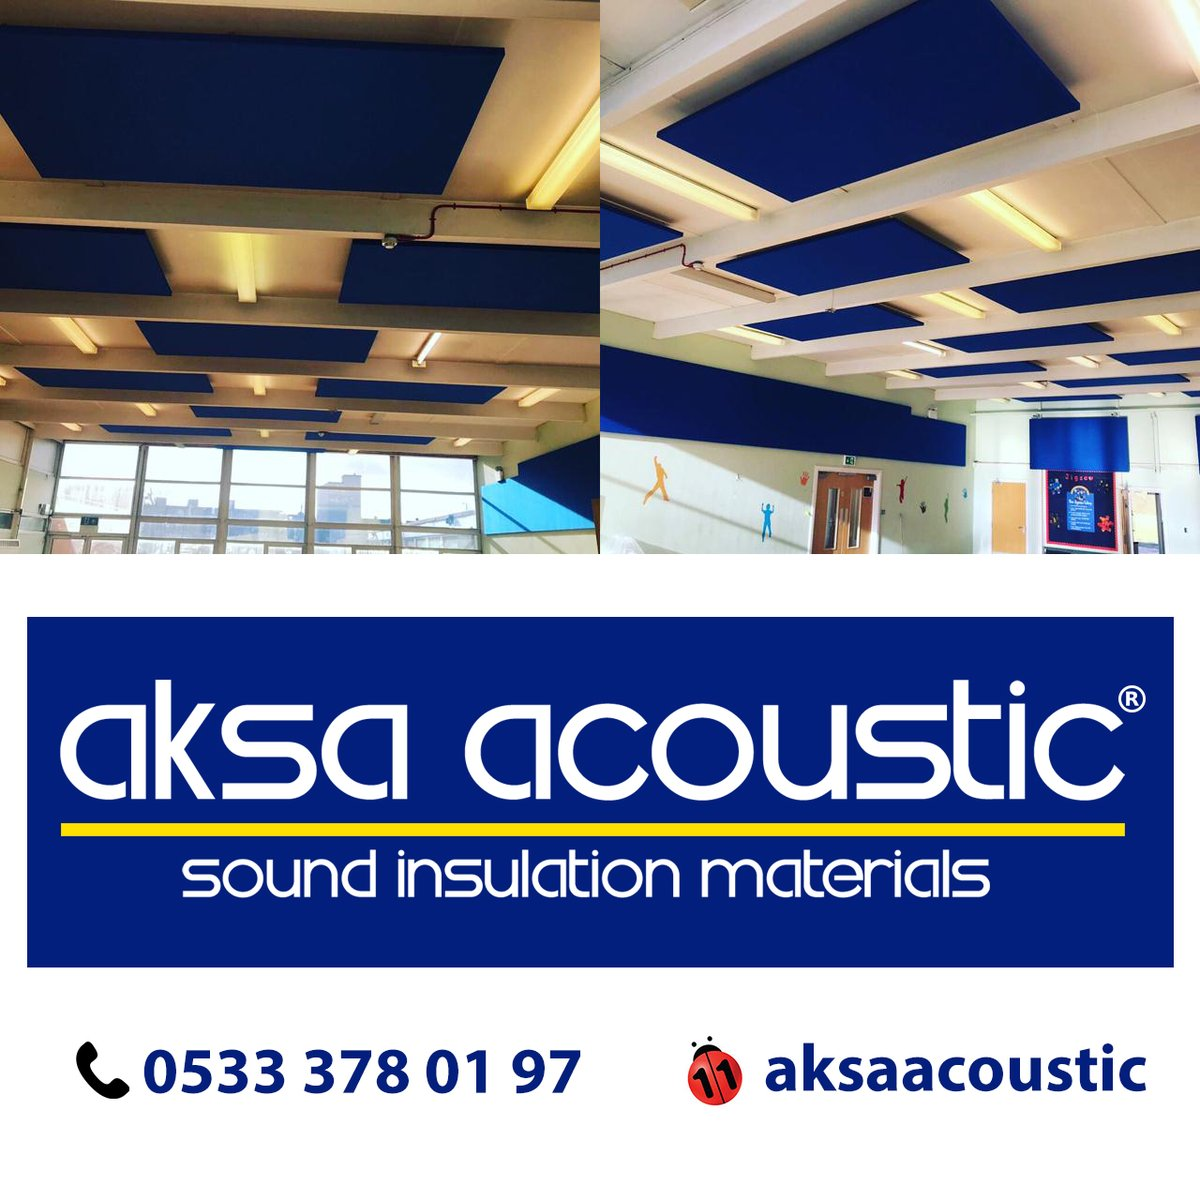 #acoustic #sound #insulation #audio #yalıtım #recording #cabinet #soundproof #panel #radio  #music #homestudio #akustik #inşaat #musicstudio #disco #vibration #vocal #voice #roomacoustics  #dekorasyon #istanbul #decoration #ses  #wall #floor  #foam #soundinsulation #kumaş #fabricpic.twitter.com/03h9koV95I